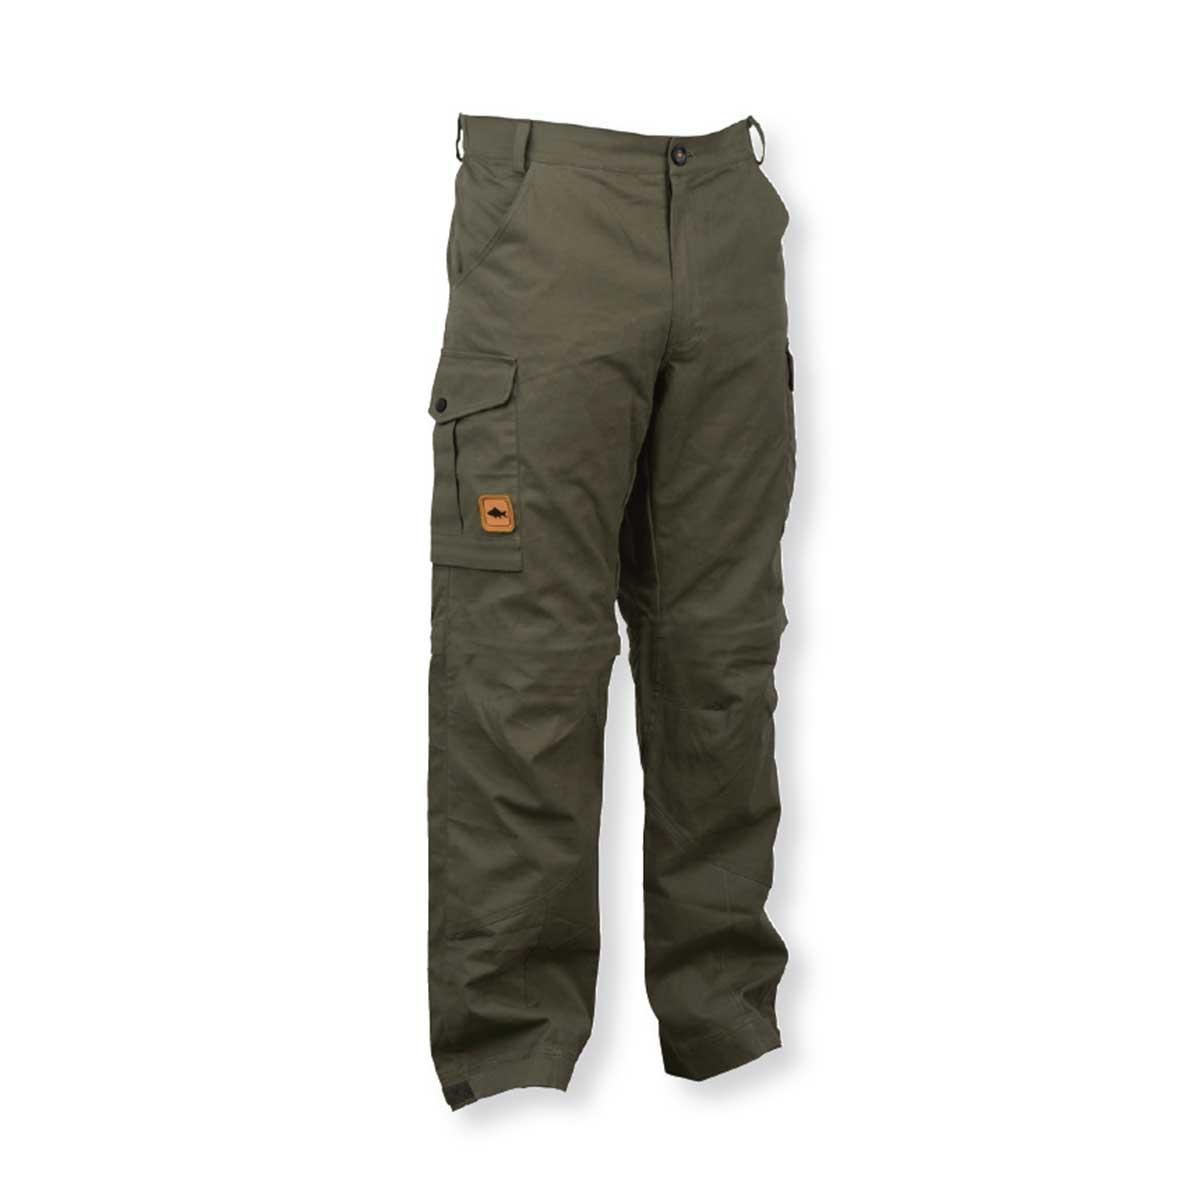 Prologic Cargo Trousers